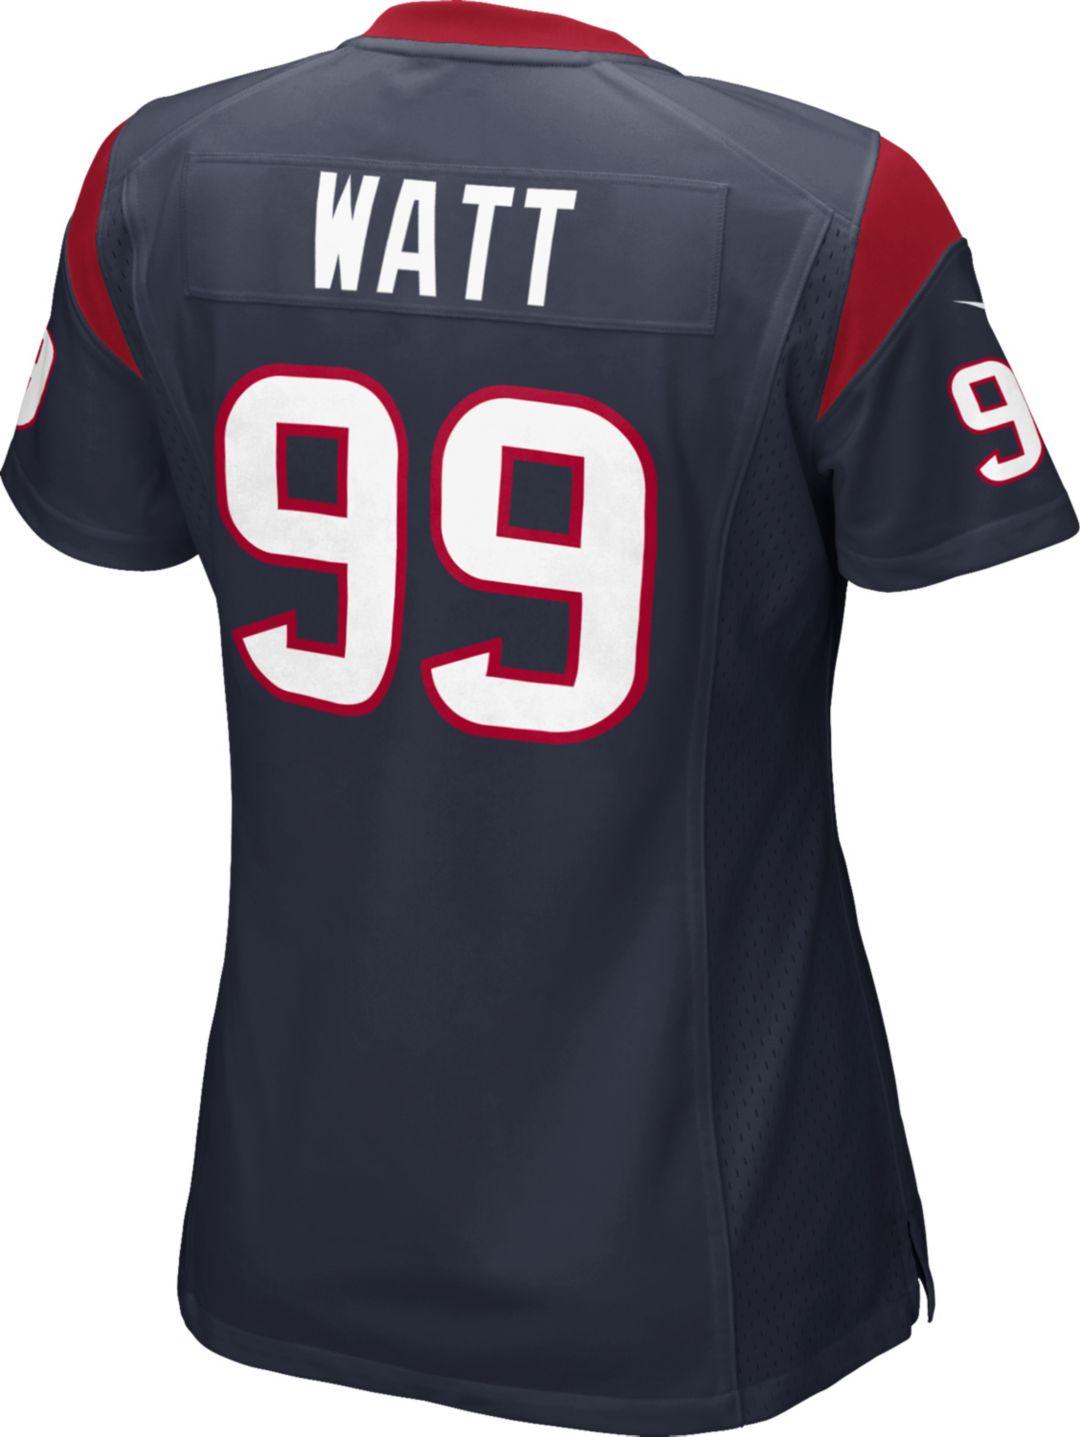 the latest 0f117 d8648 Nike Women's Home Game Jersey Houston Texans J.J. Watt #99